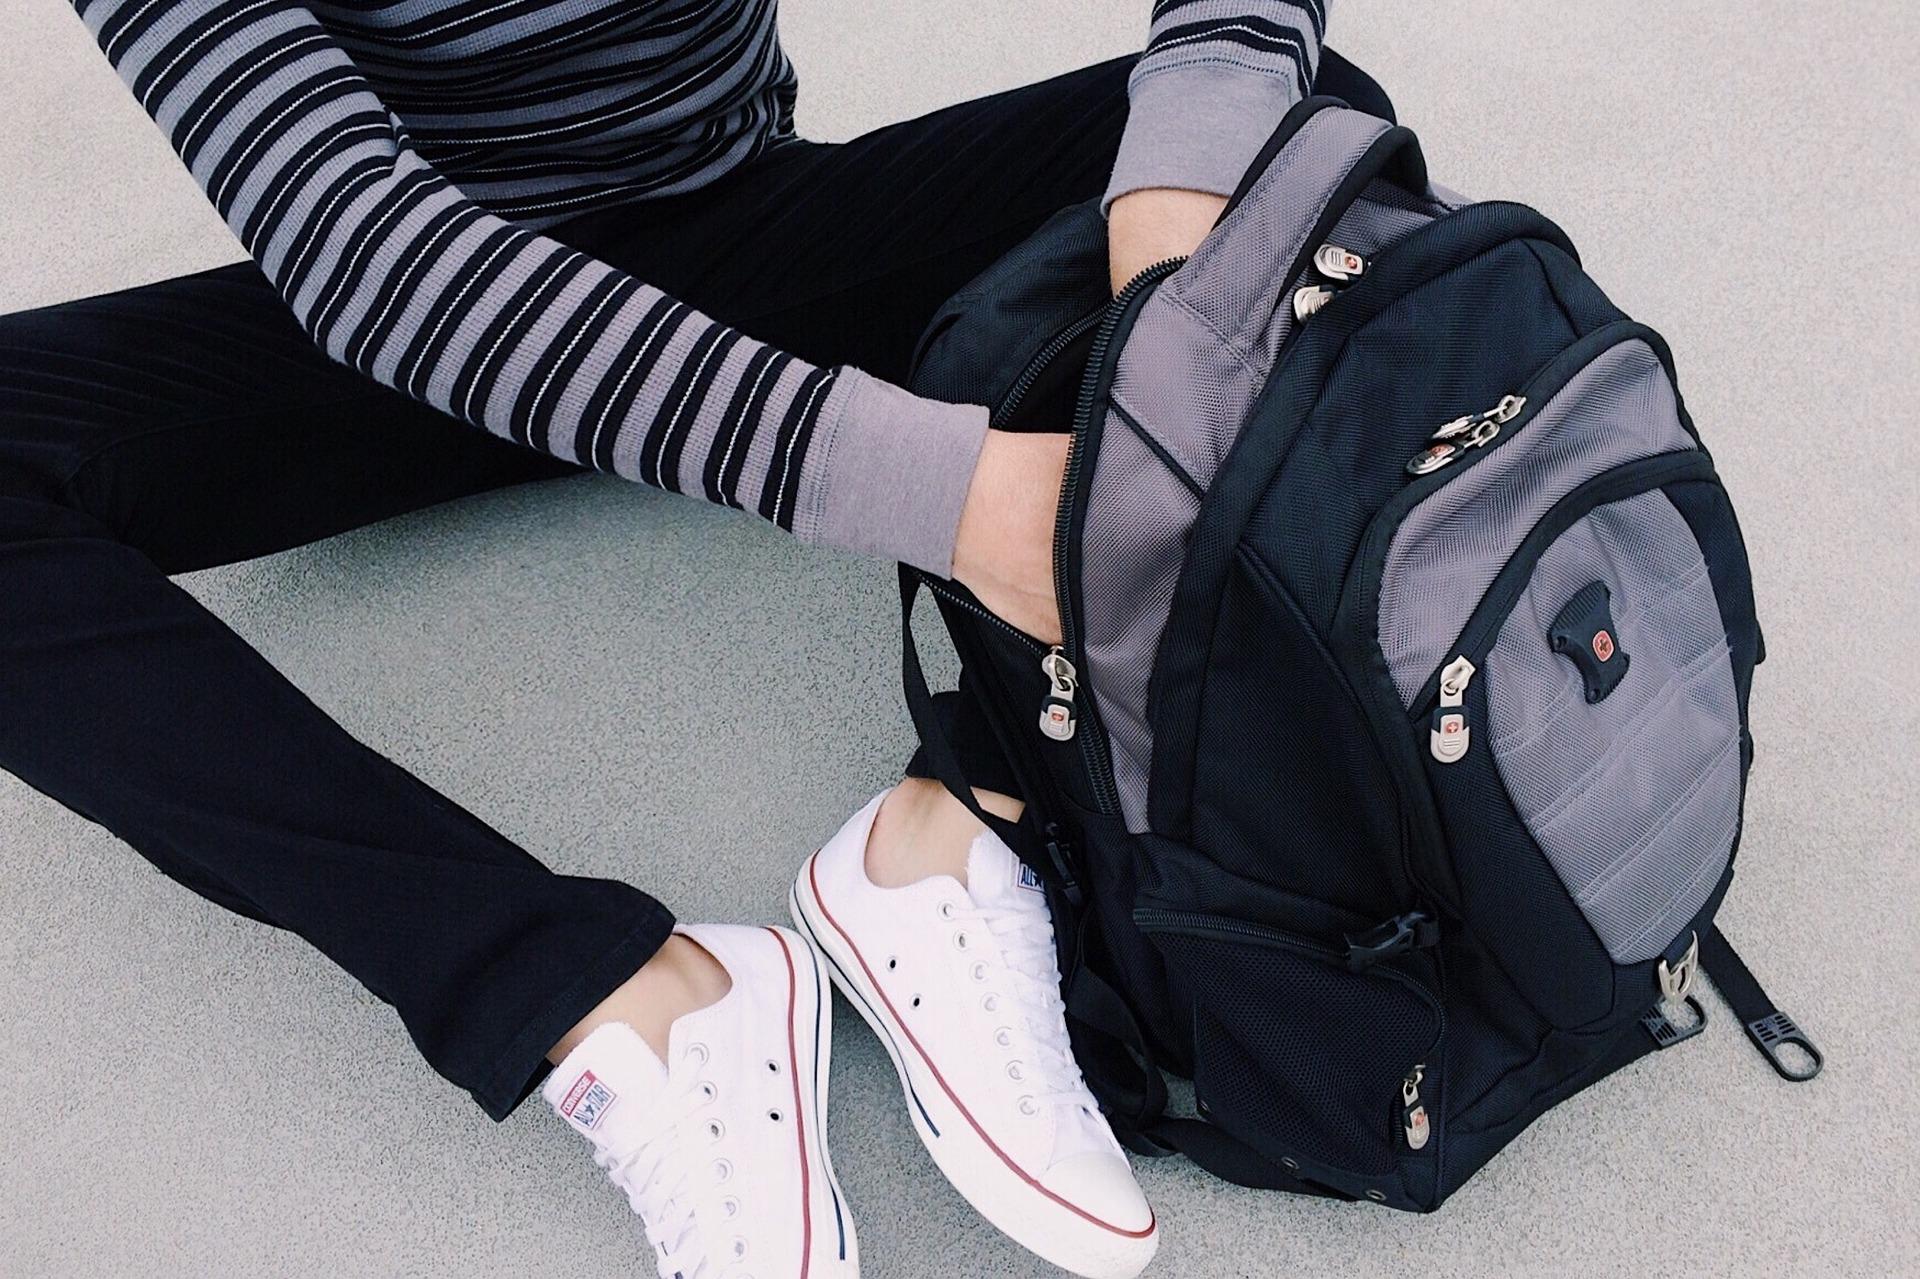 mochila para el instituto